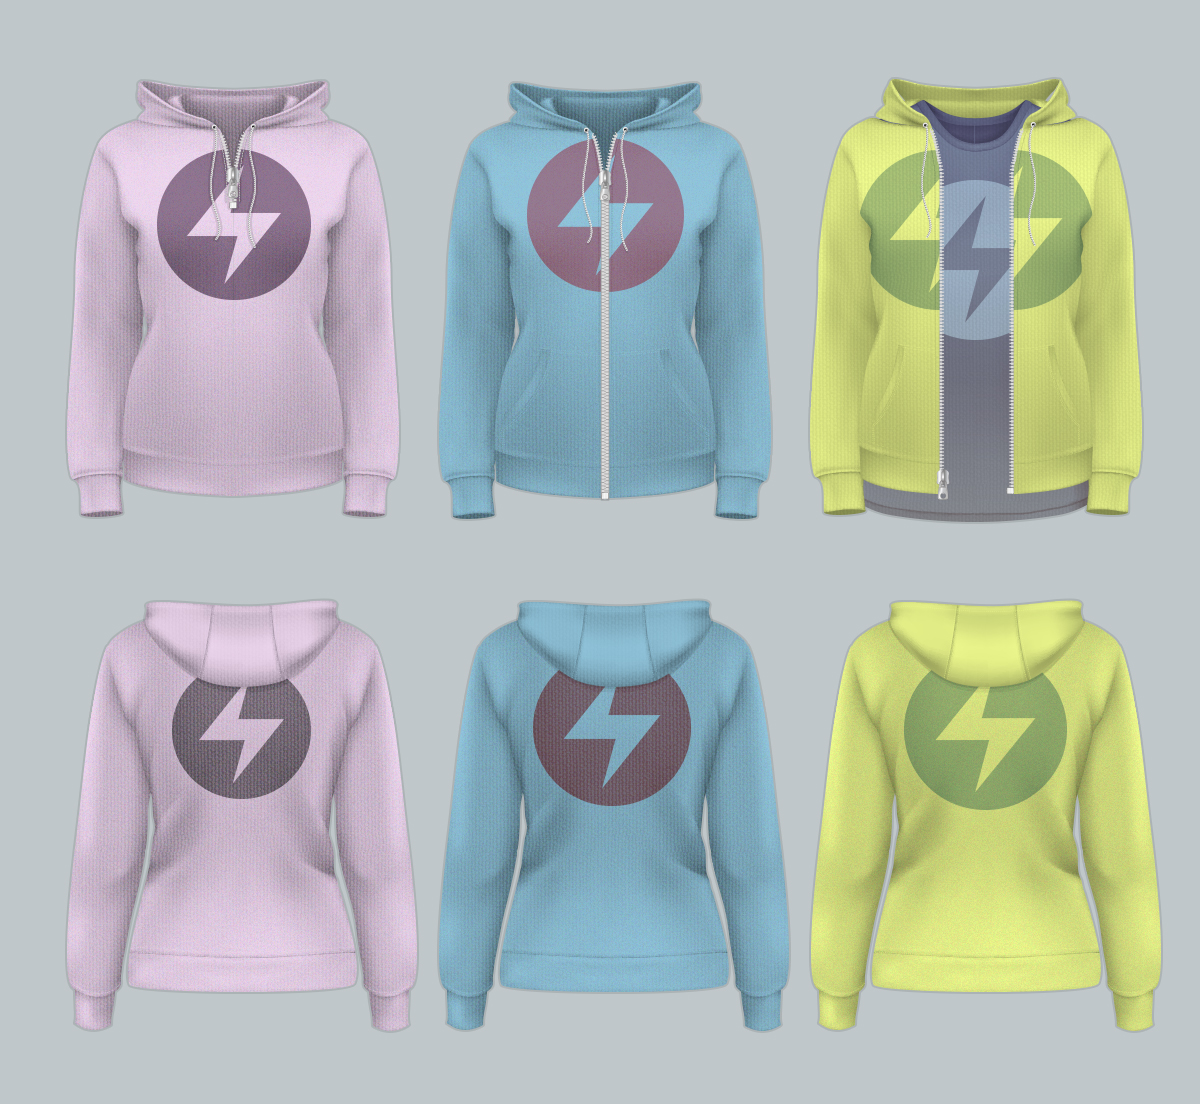 jackets-woman-color